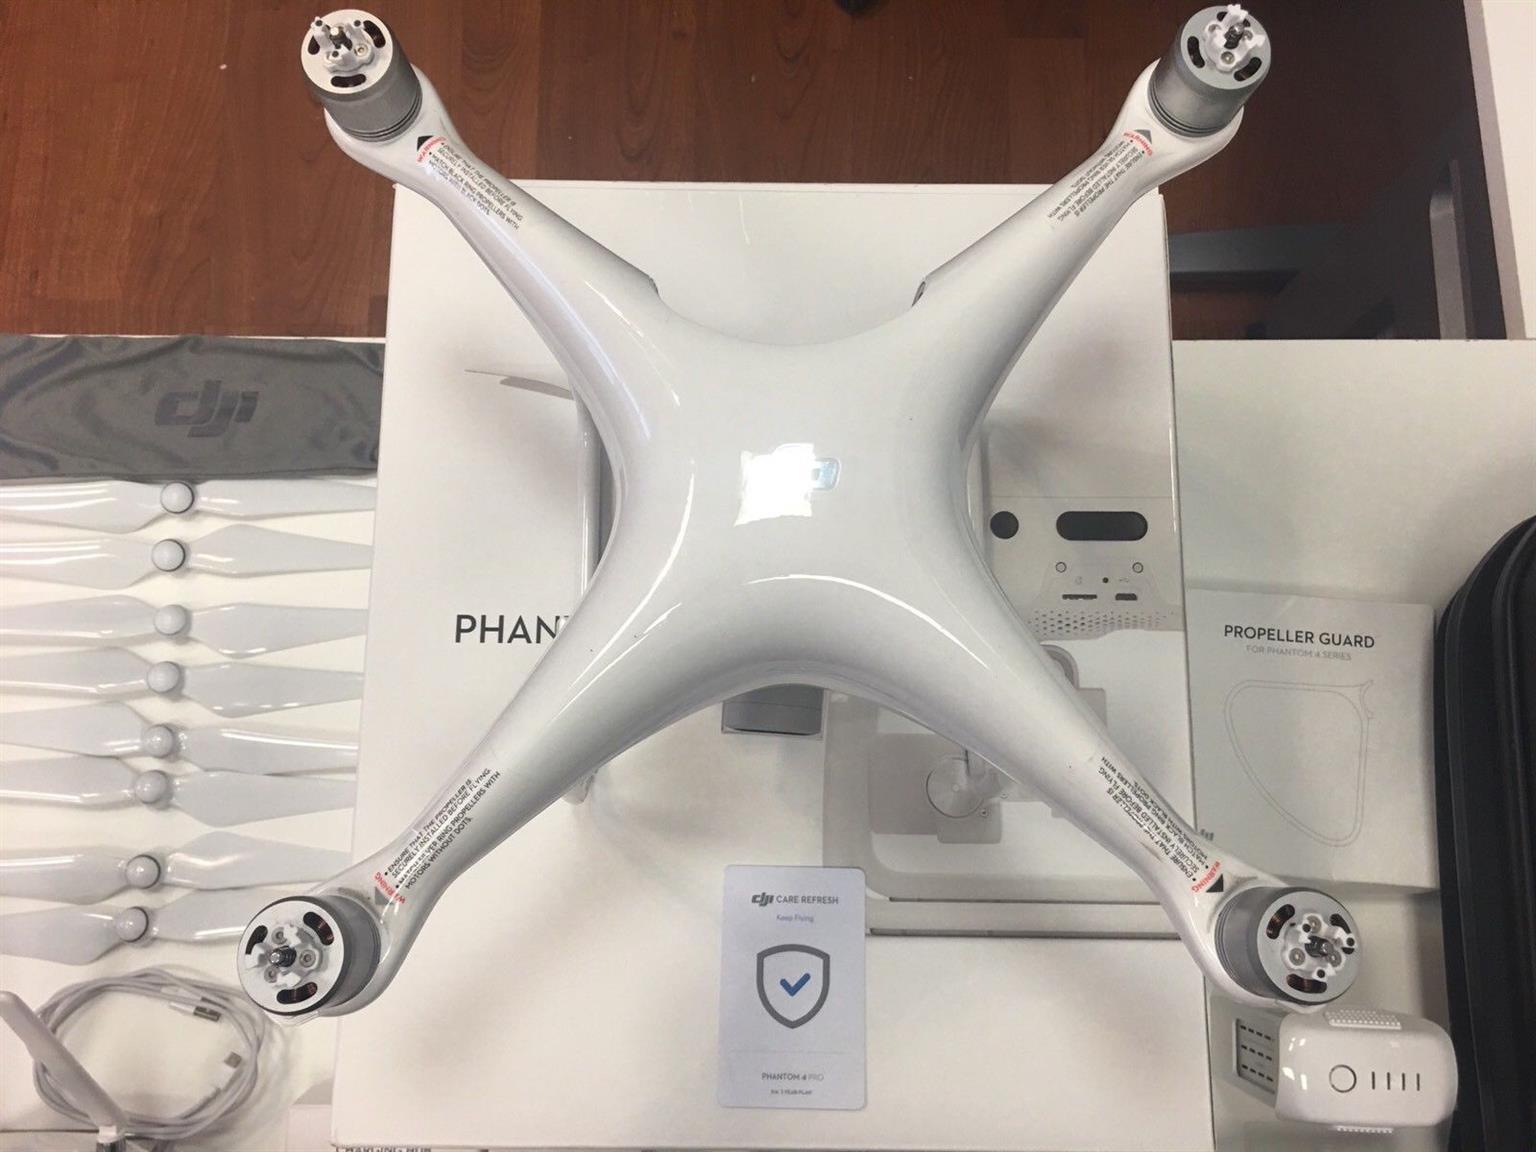 Fairly used DJI phantom 4 professional plus 3 hours flying time